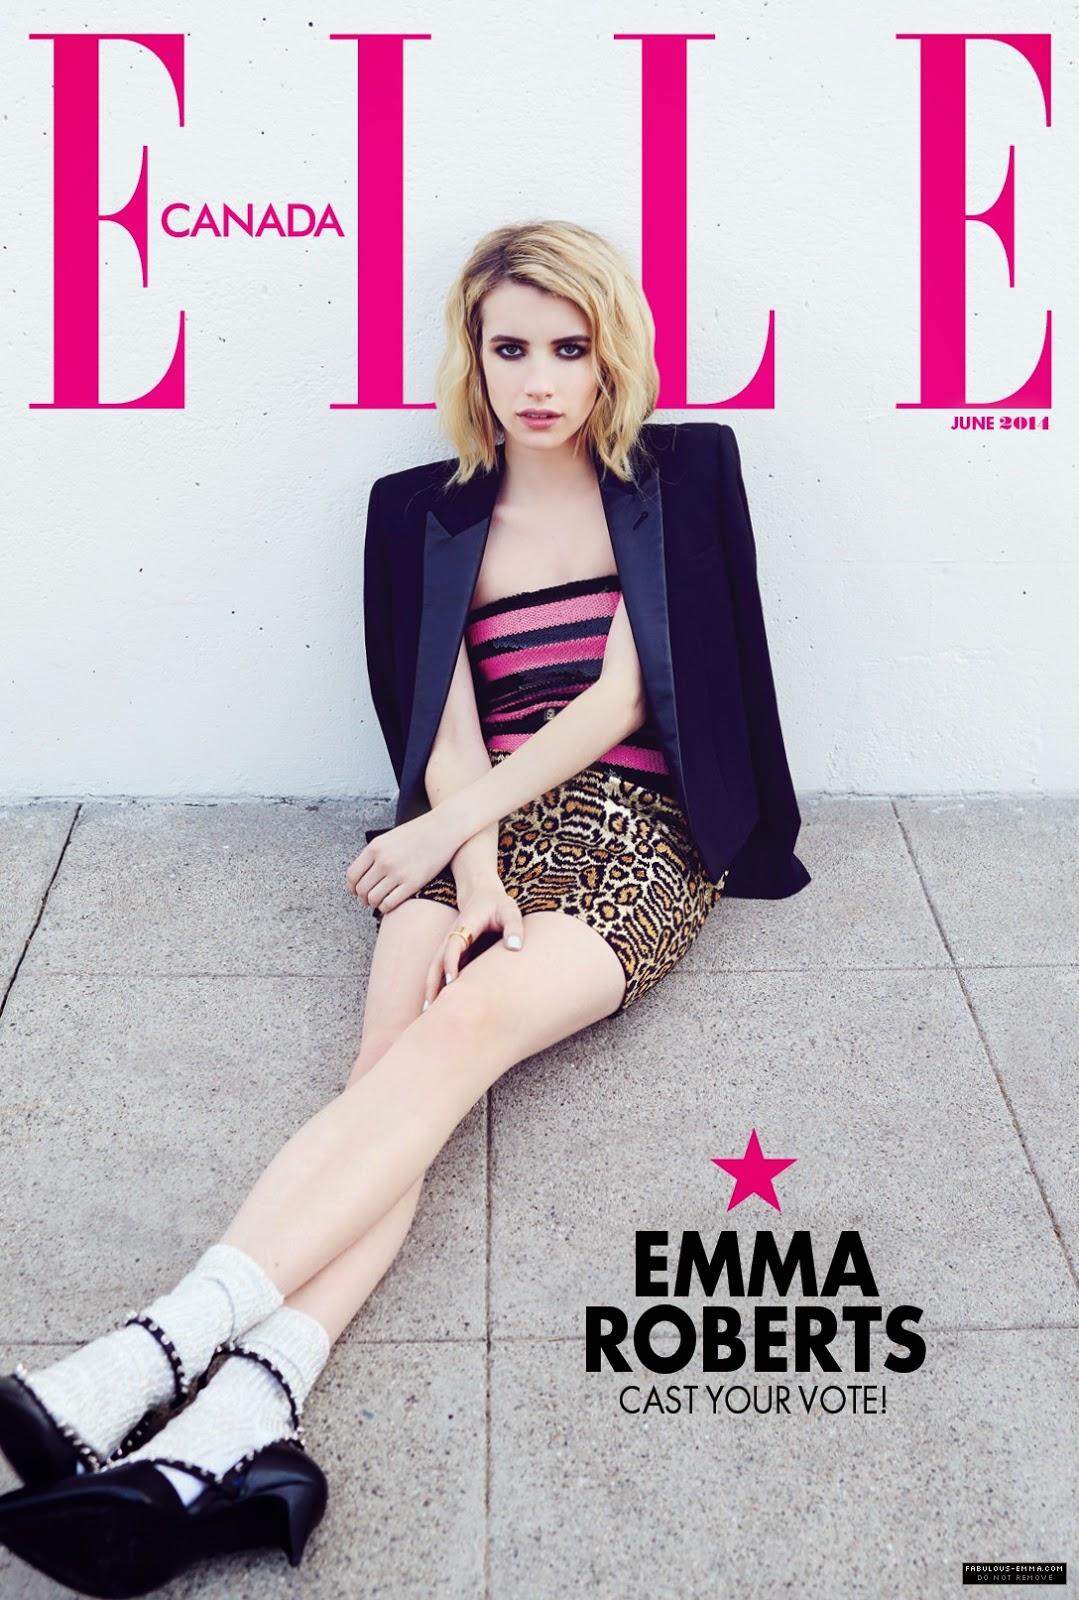 Emma Roberts For Elle Magazine, Canada, Junho 2014